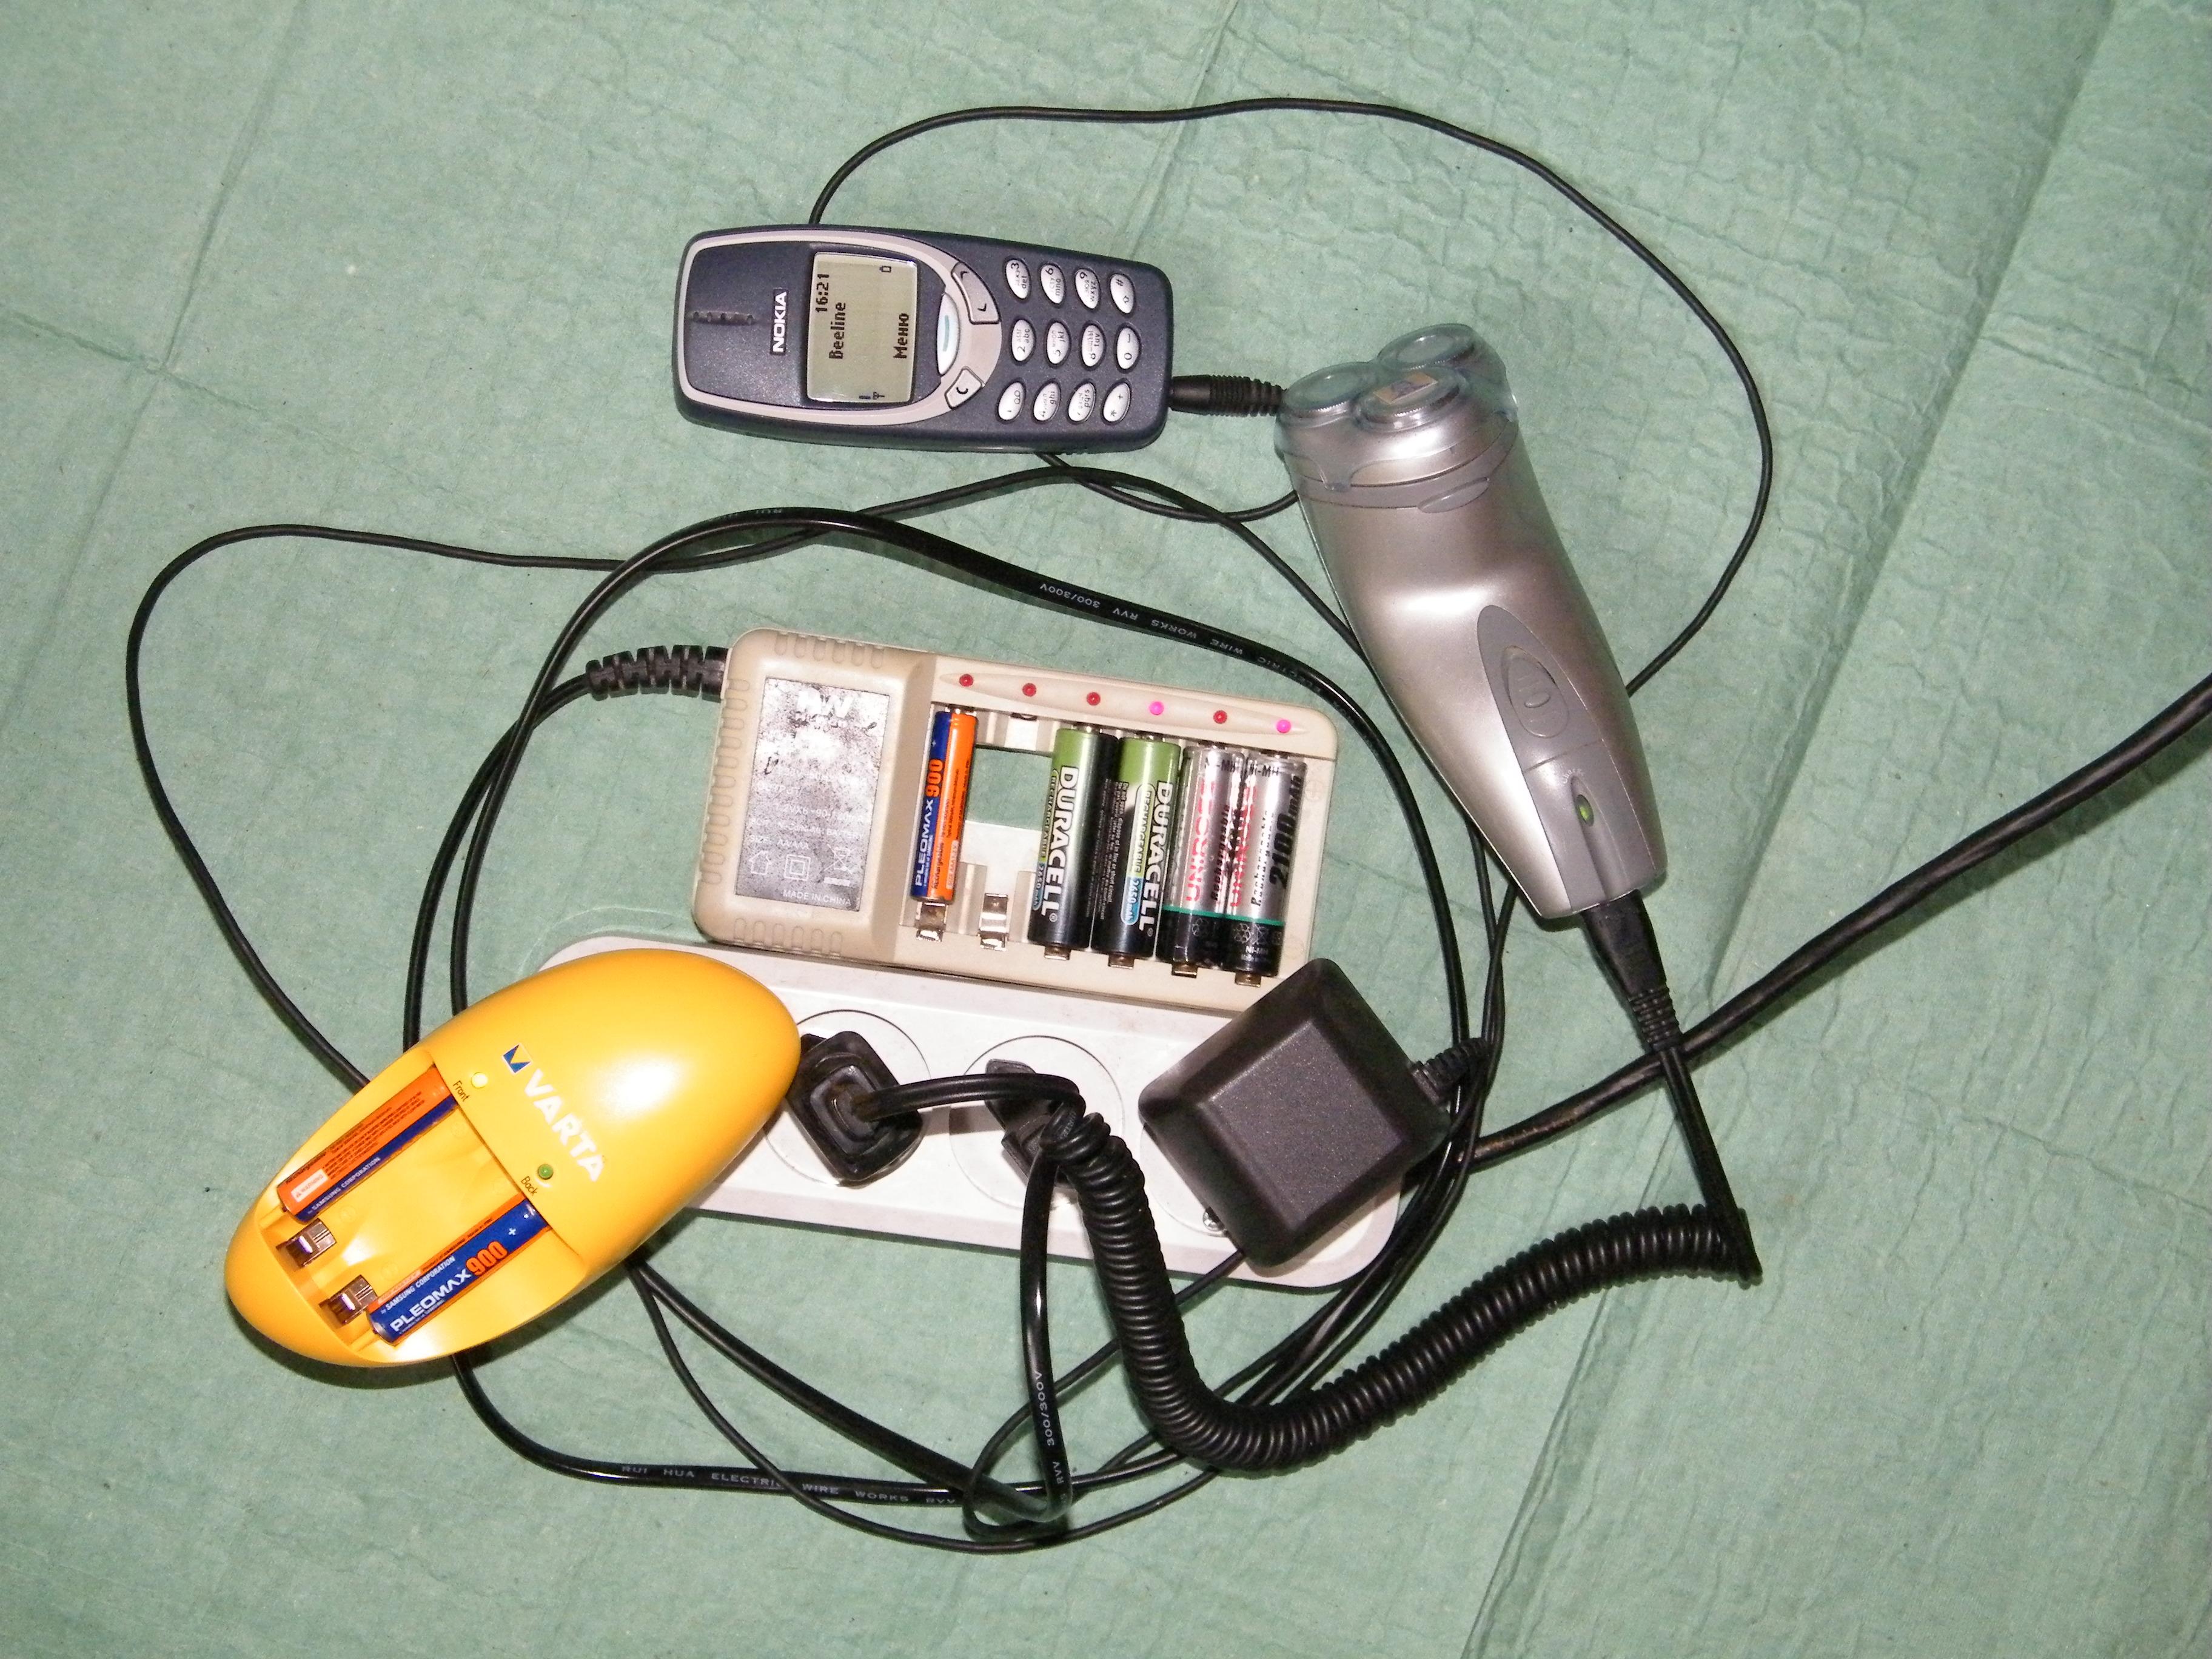 Устройство для зарядки аккумулятора телефона схема